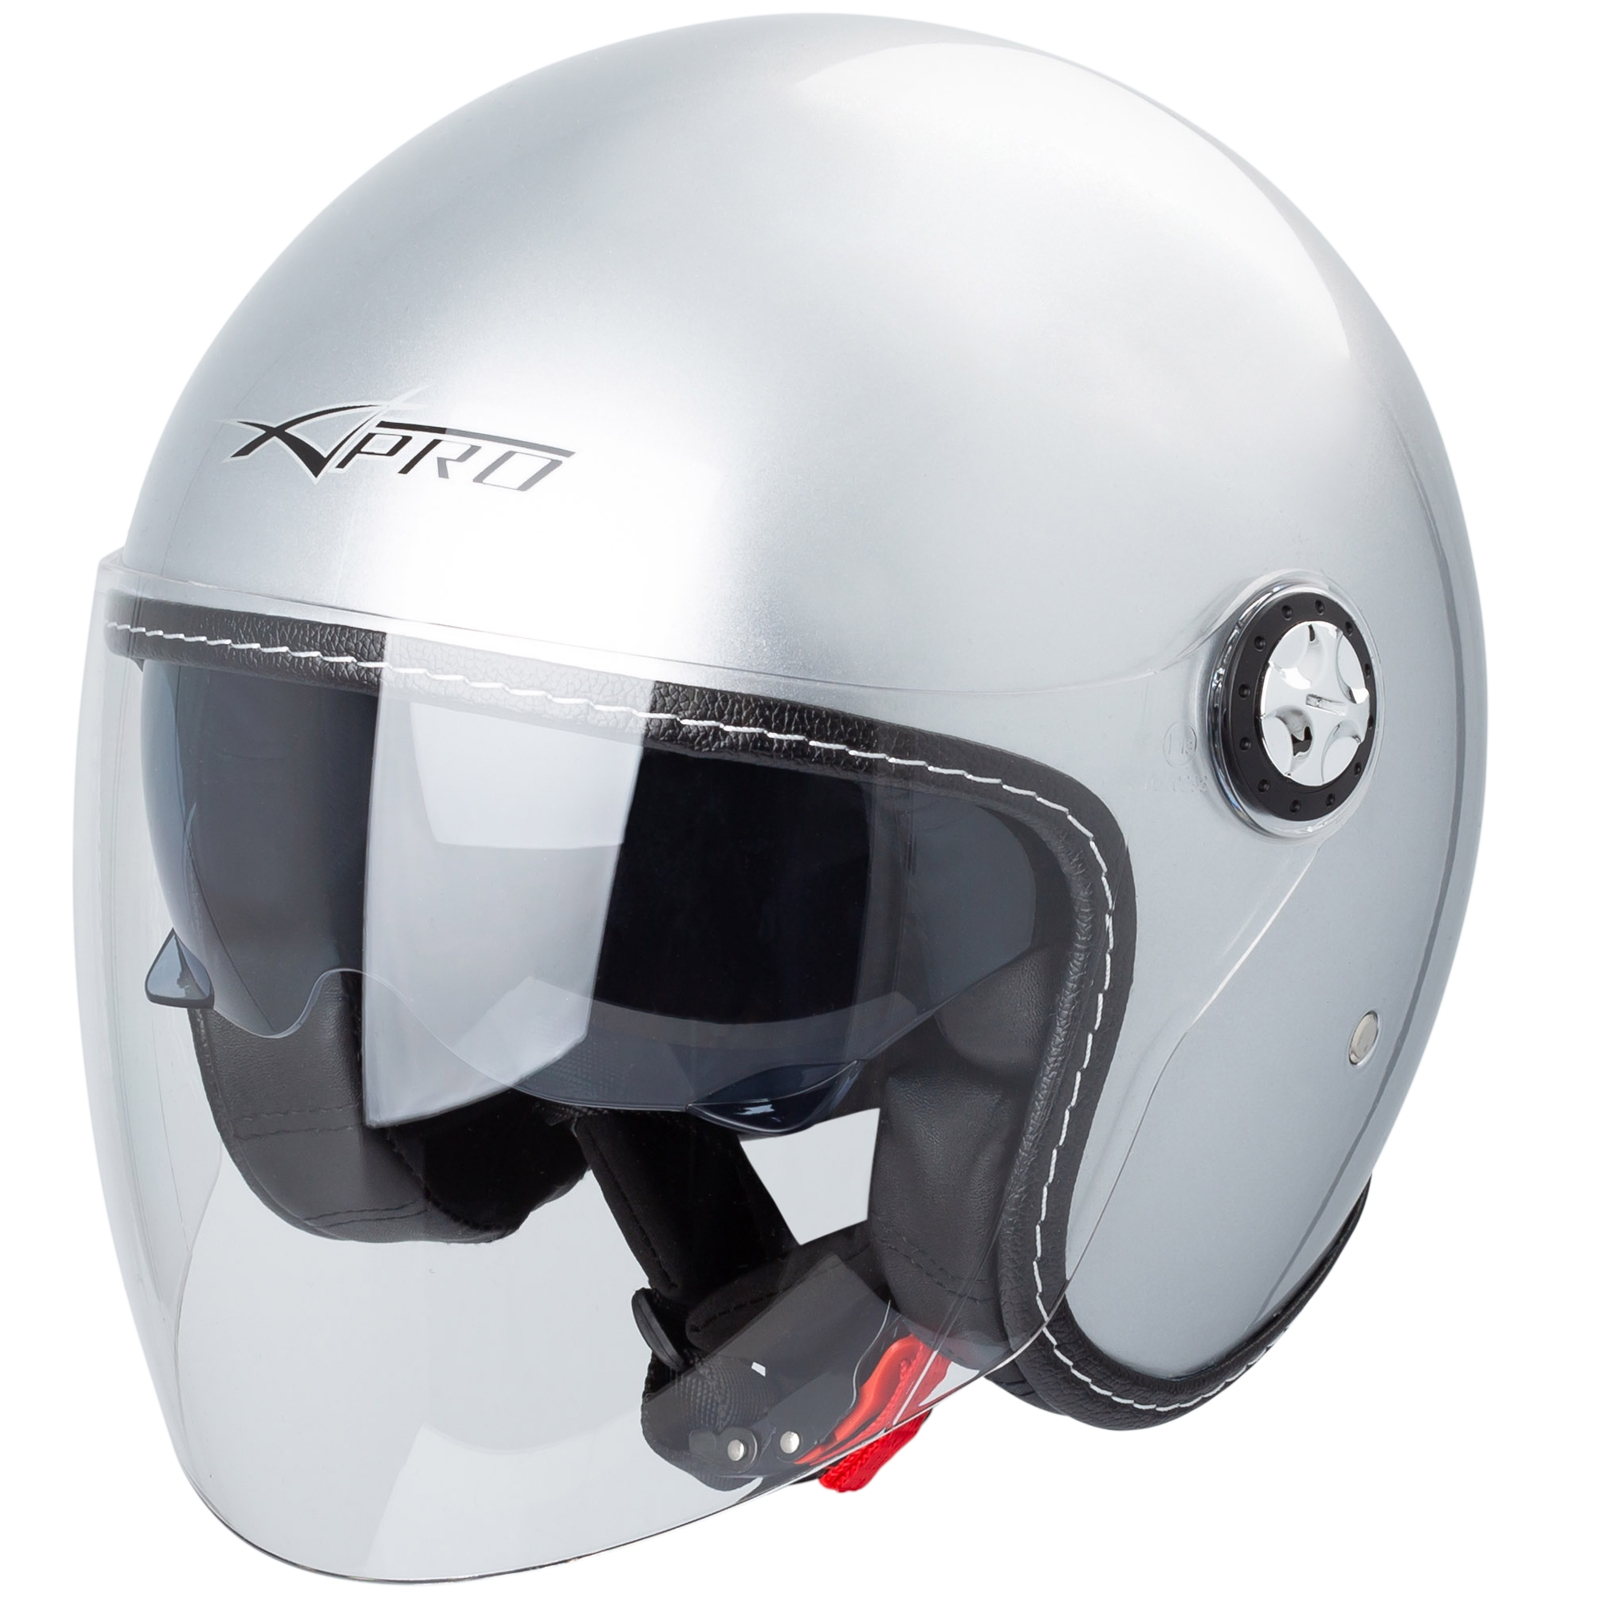 Casco Flip Up doppia visiera per moto L argento GOTOTOP